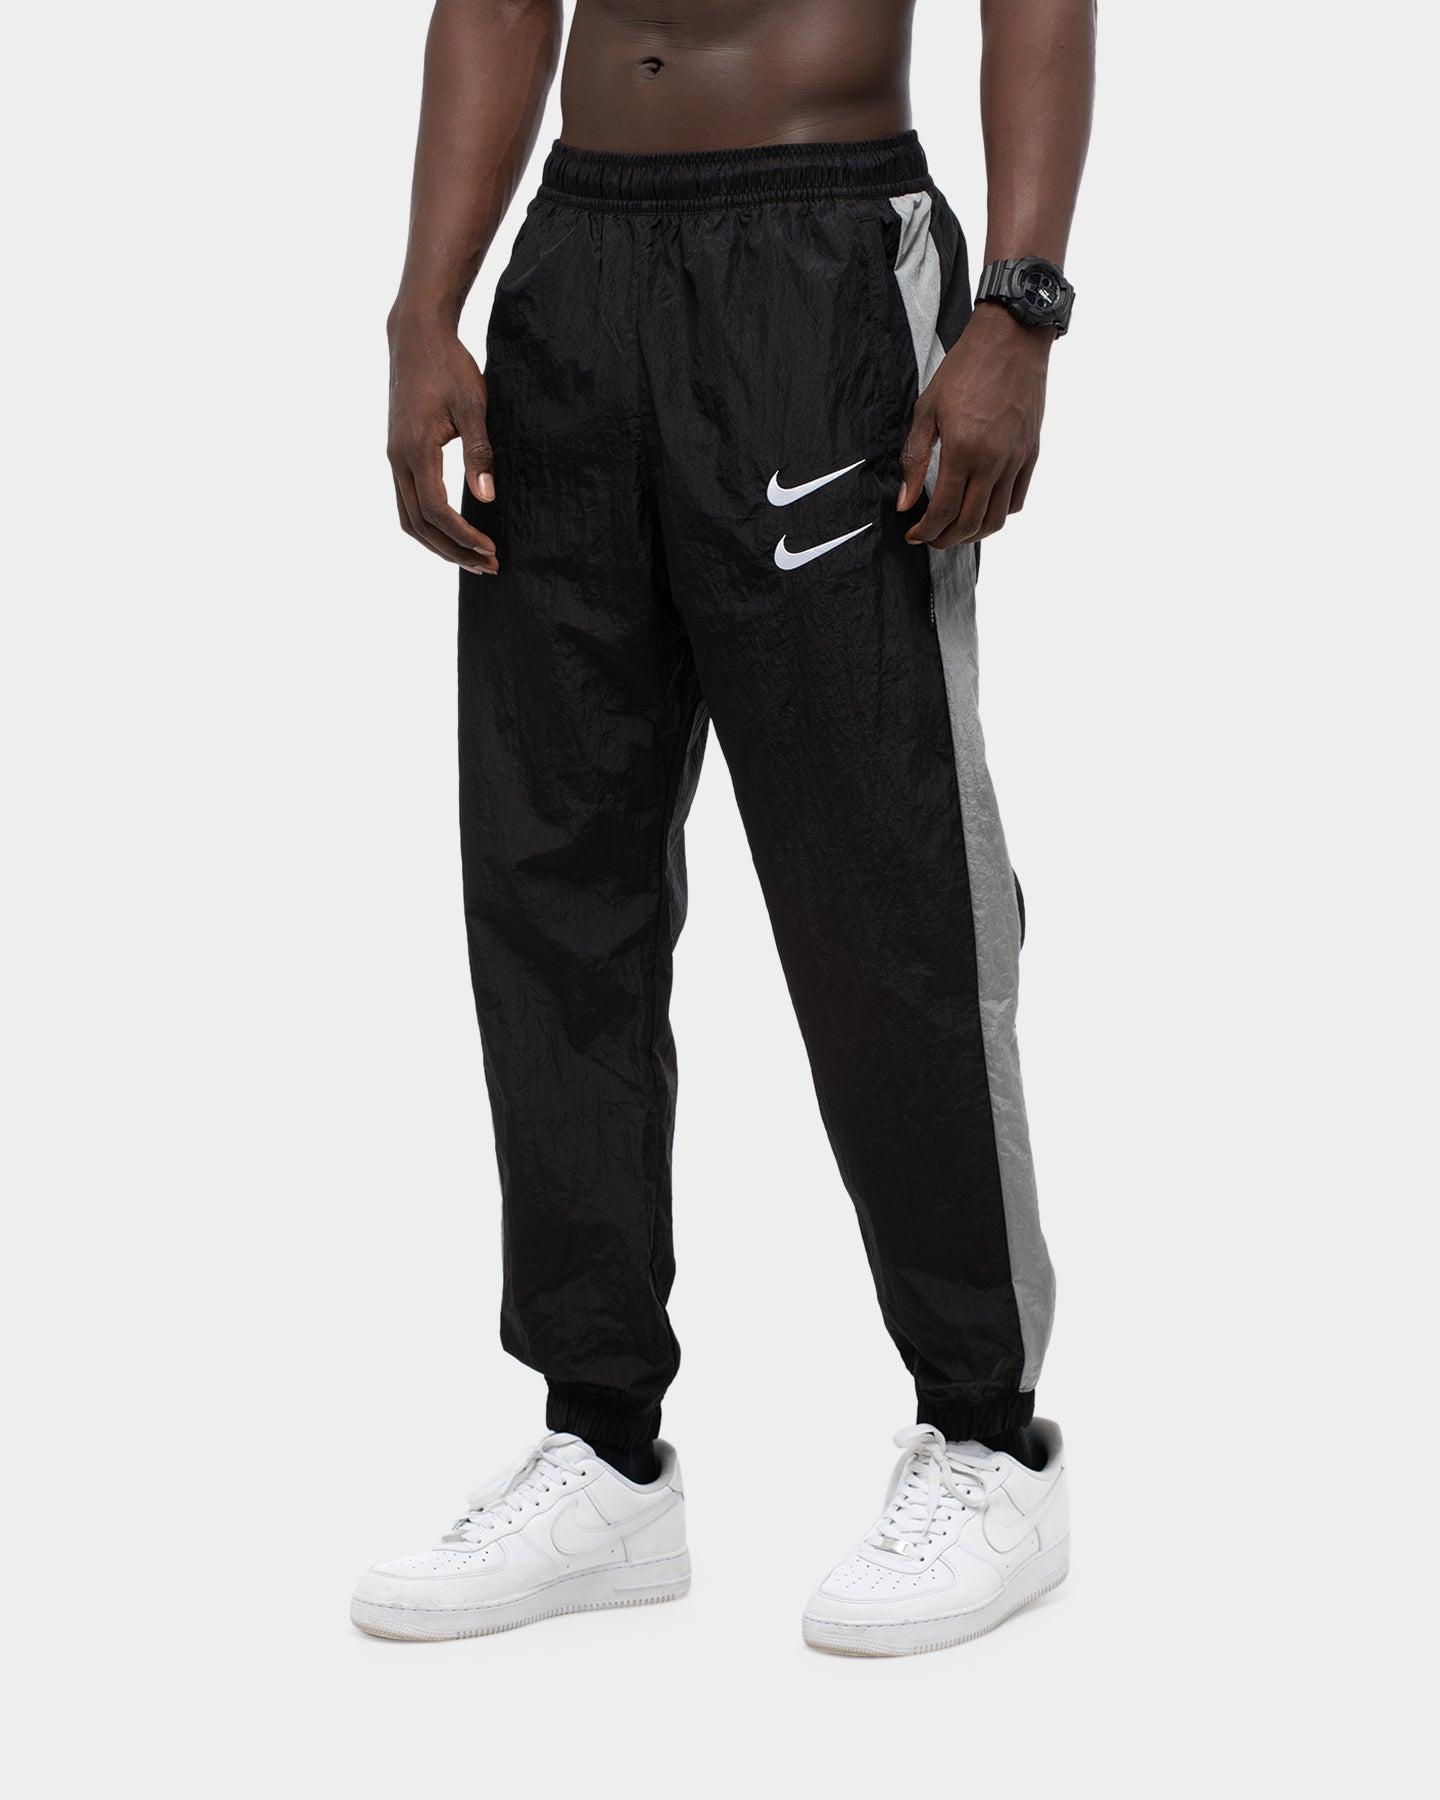 NBA Toronto Raptors New Era Core Fleece Pants Trousers Bottoms Mens